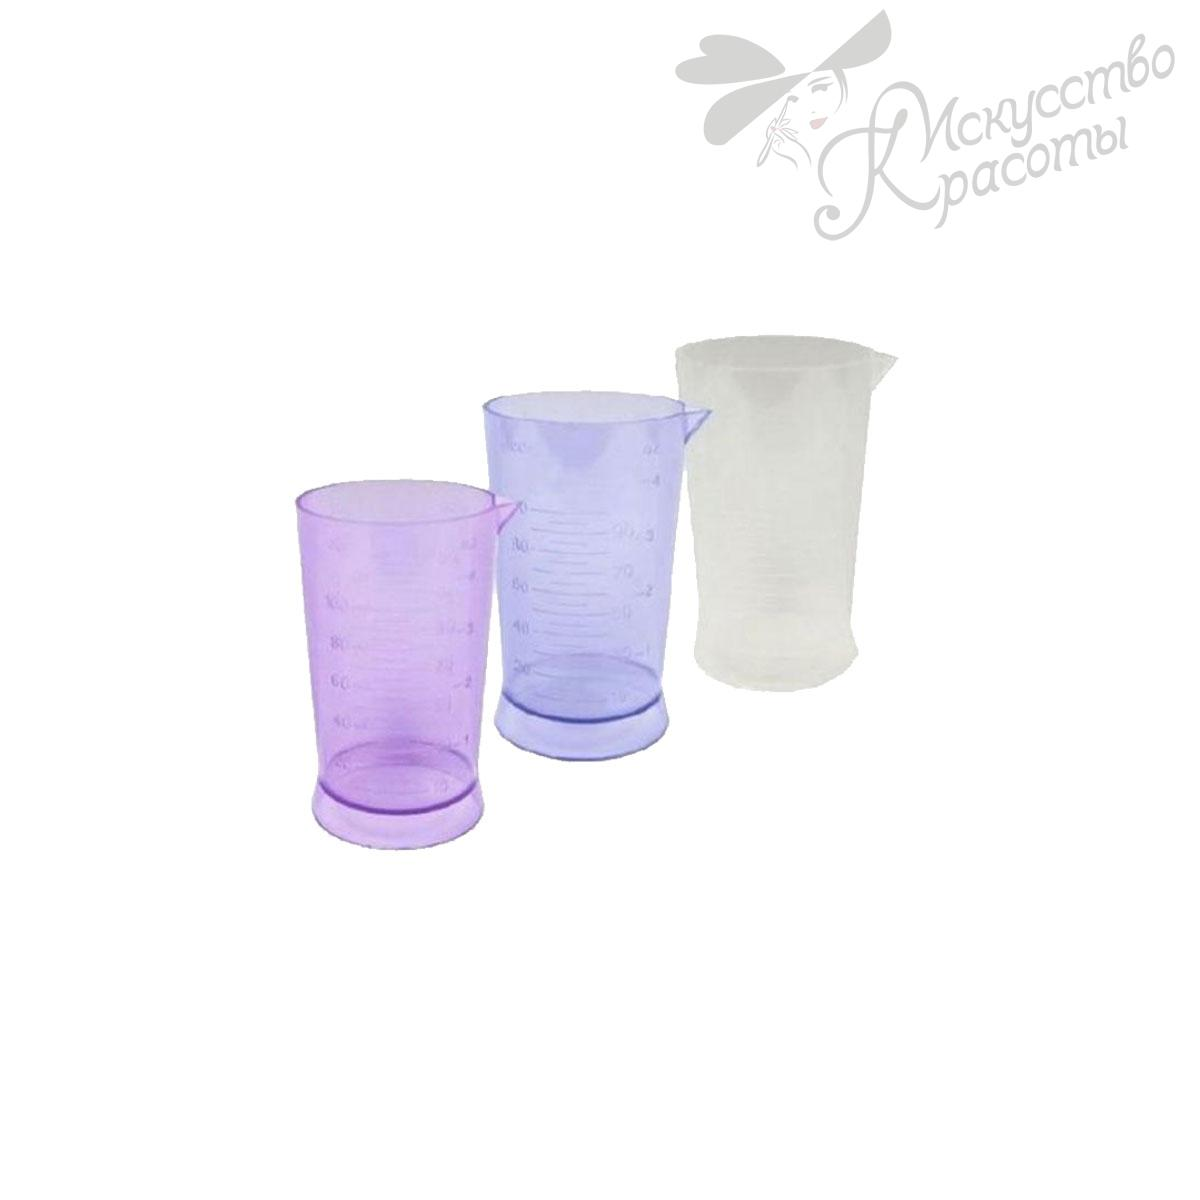 Мерный стакан для краски TICO 100 мл